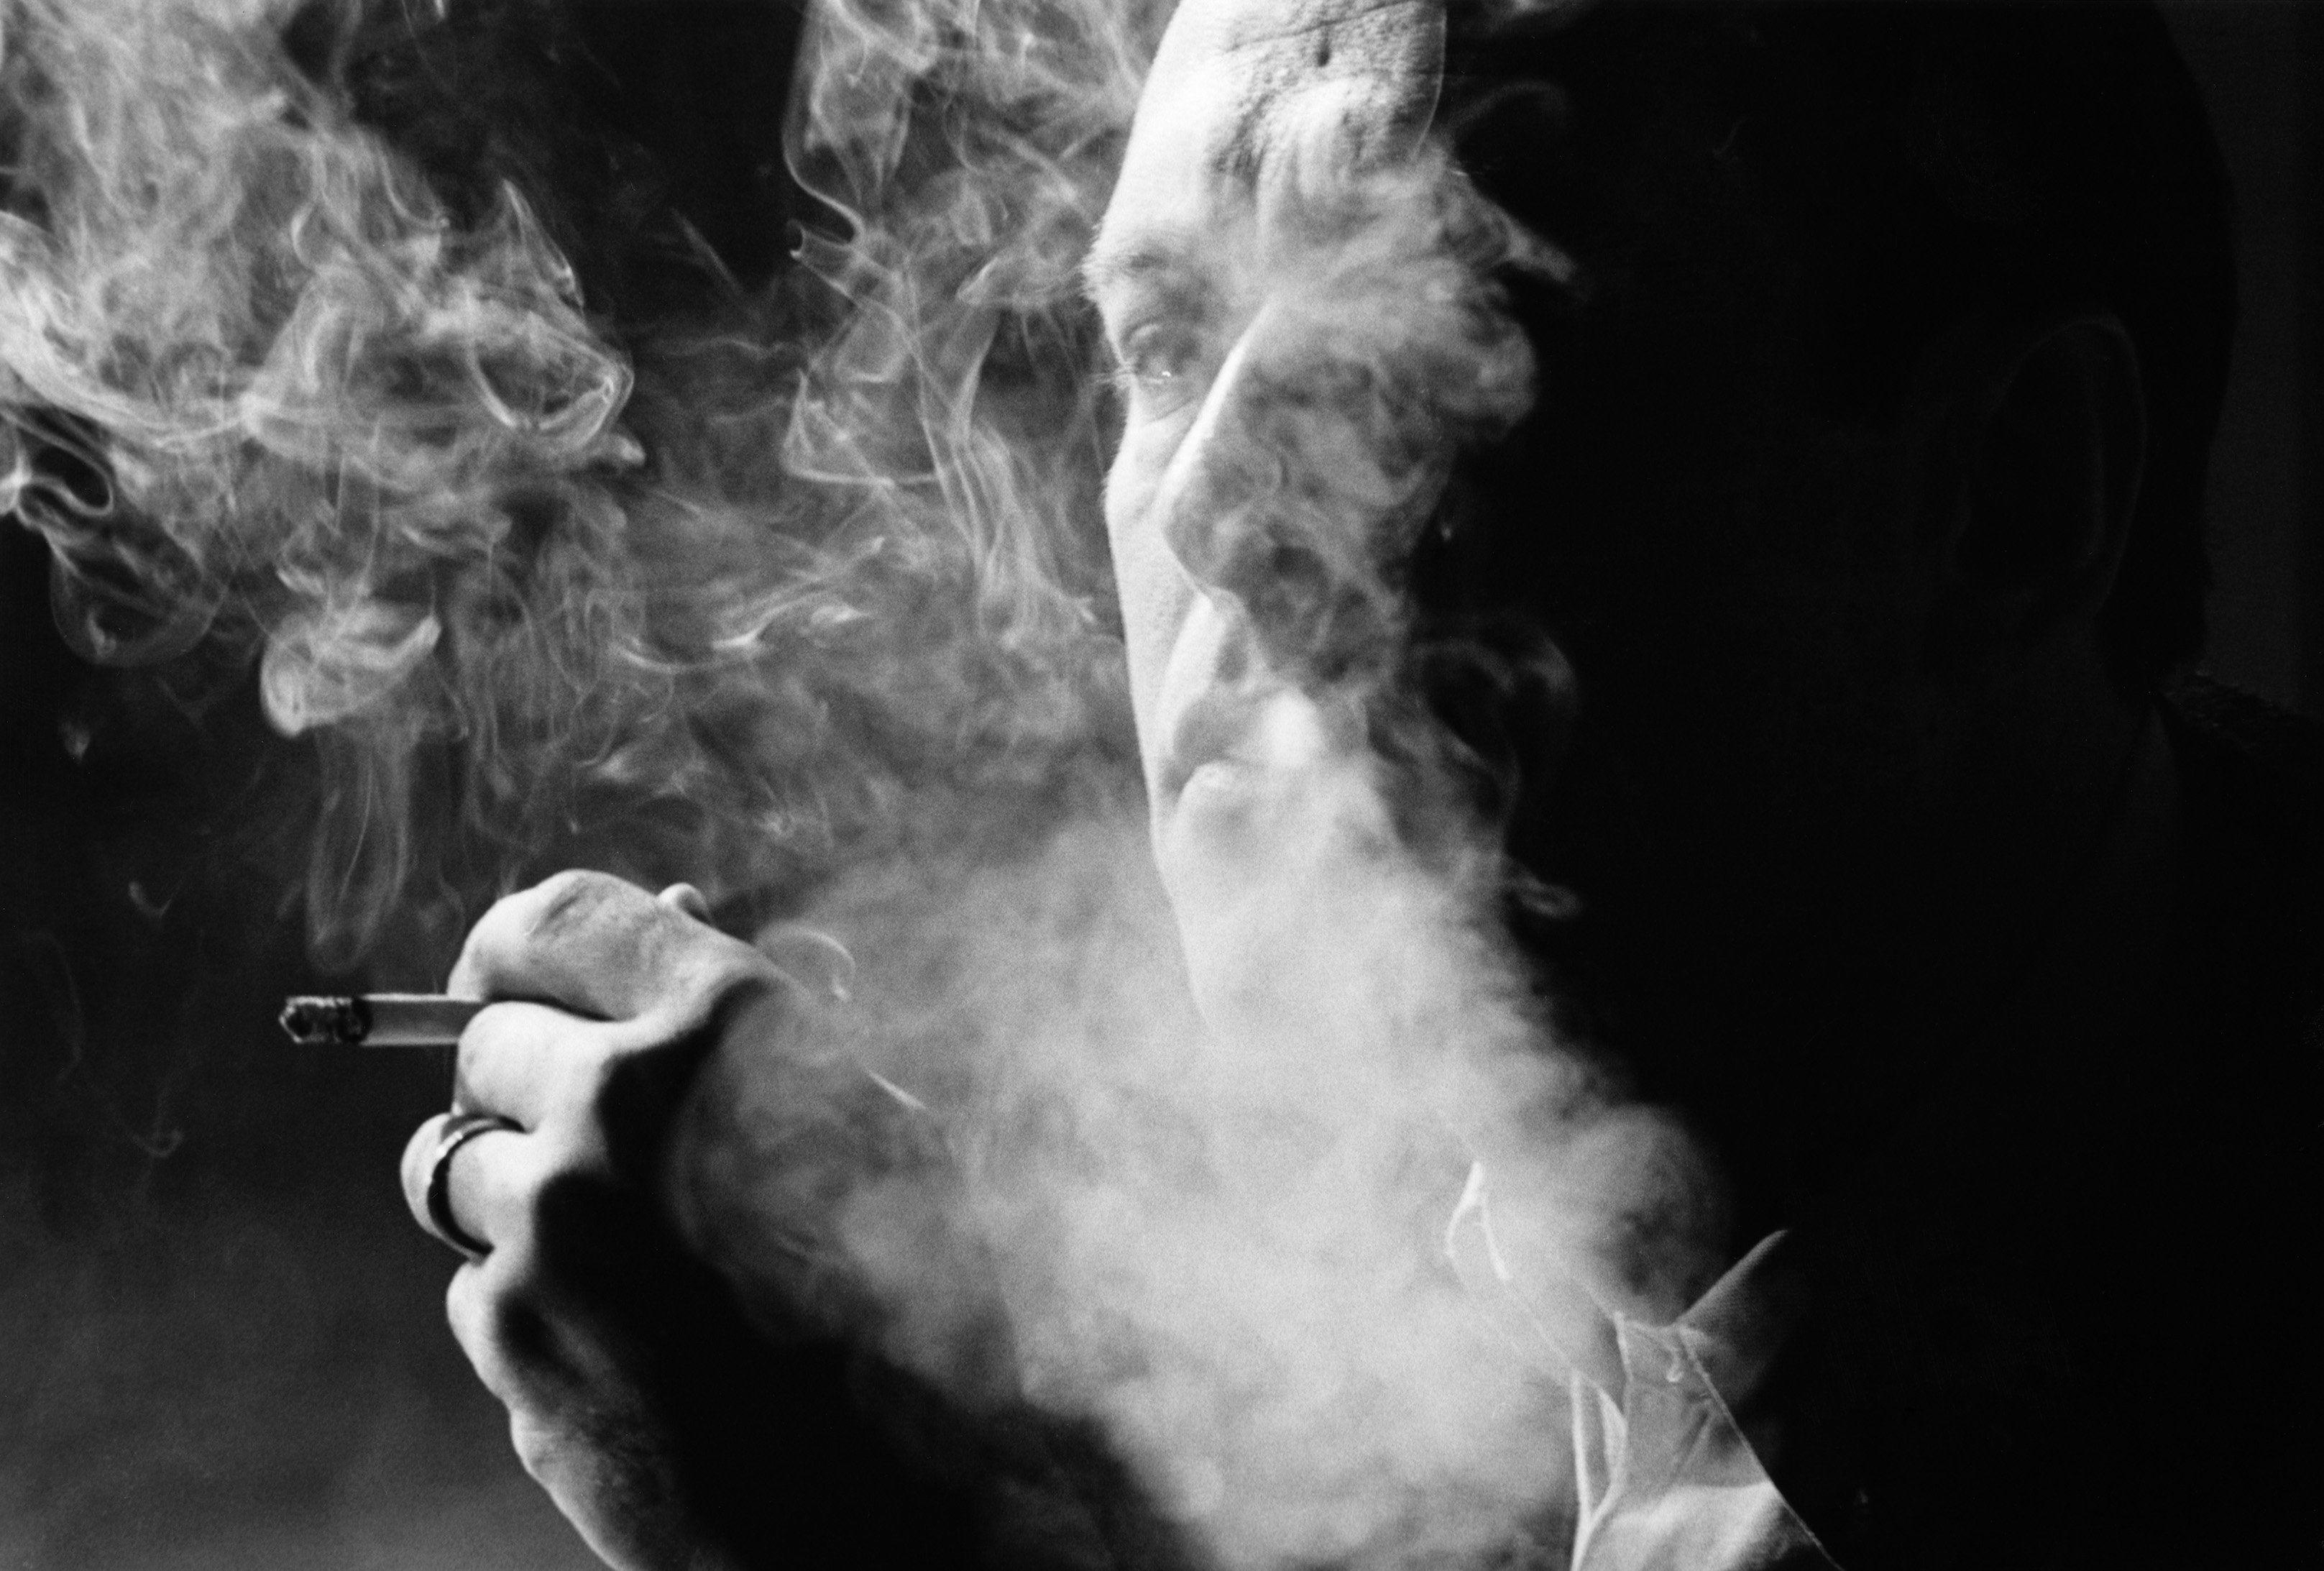 Smoking wallpaper qygjxz